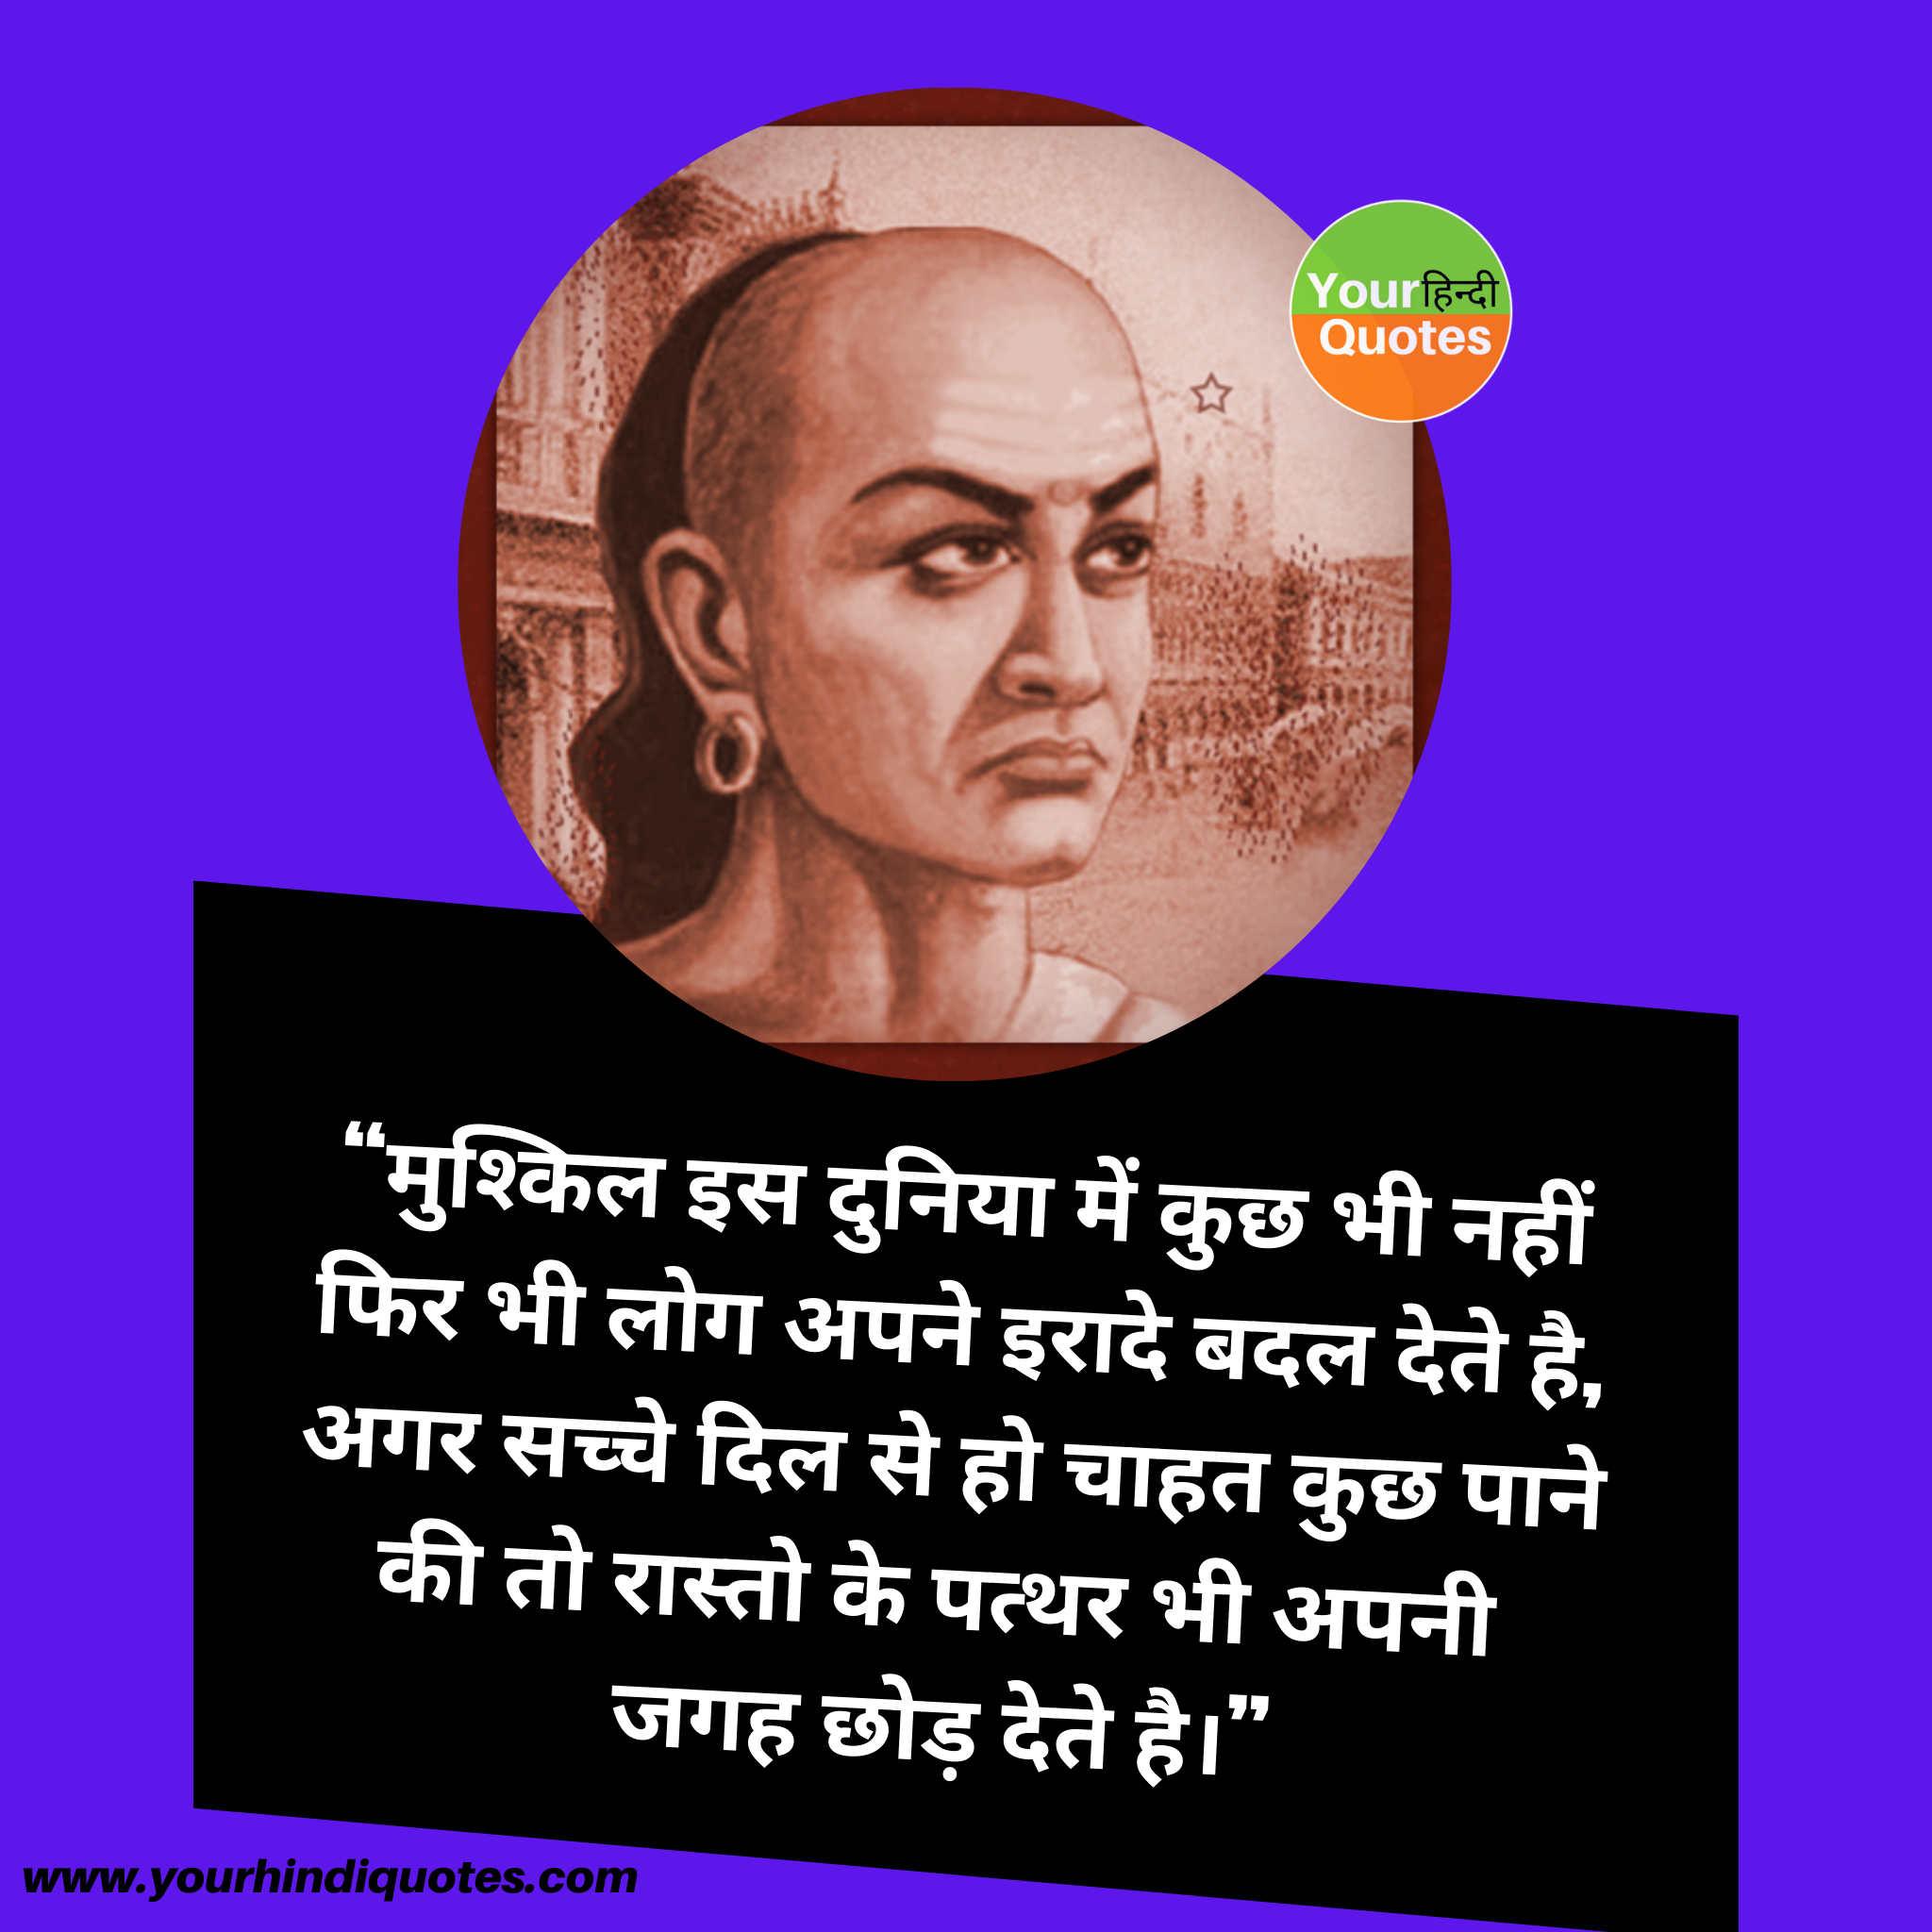 Chanakya Niti Quotes Photos